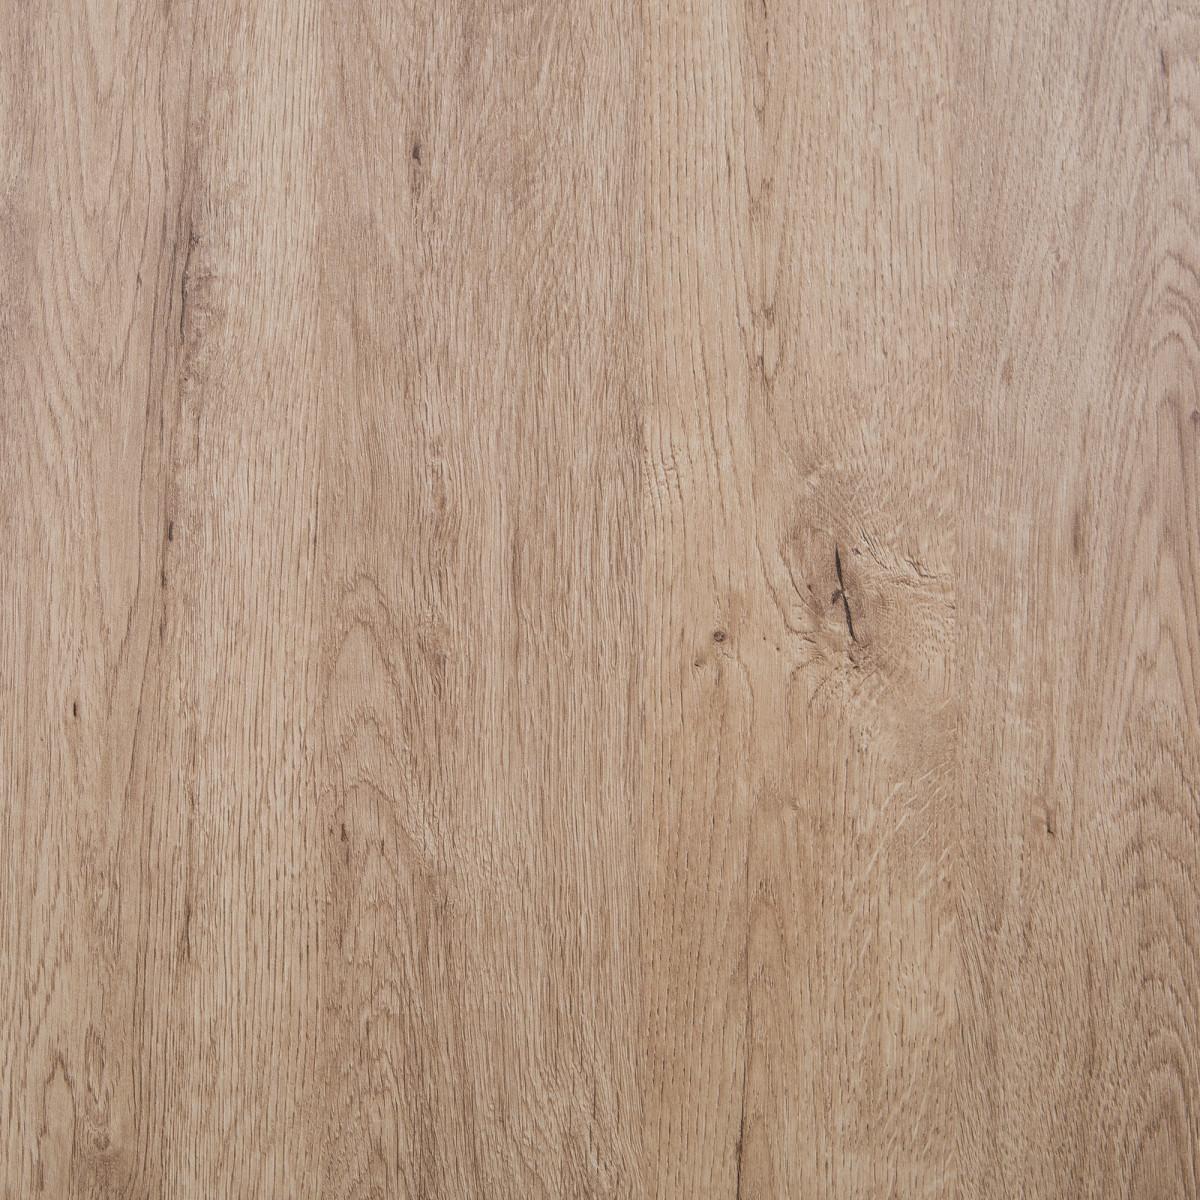 Столешница Дуб Корсика 120х60х2.6 см ДВП цвет бежевый